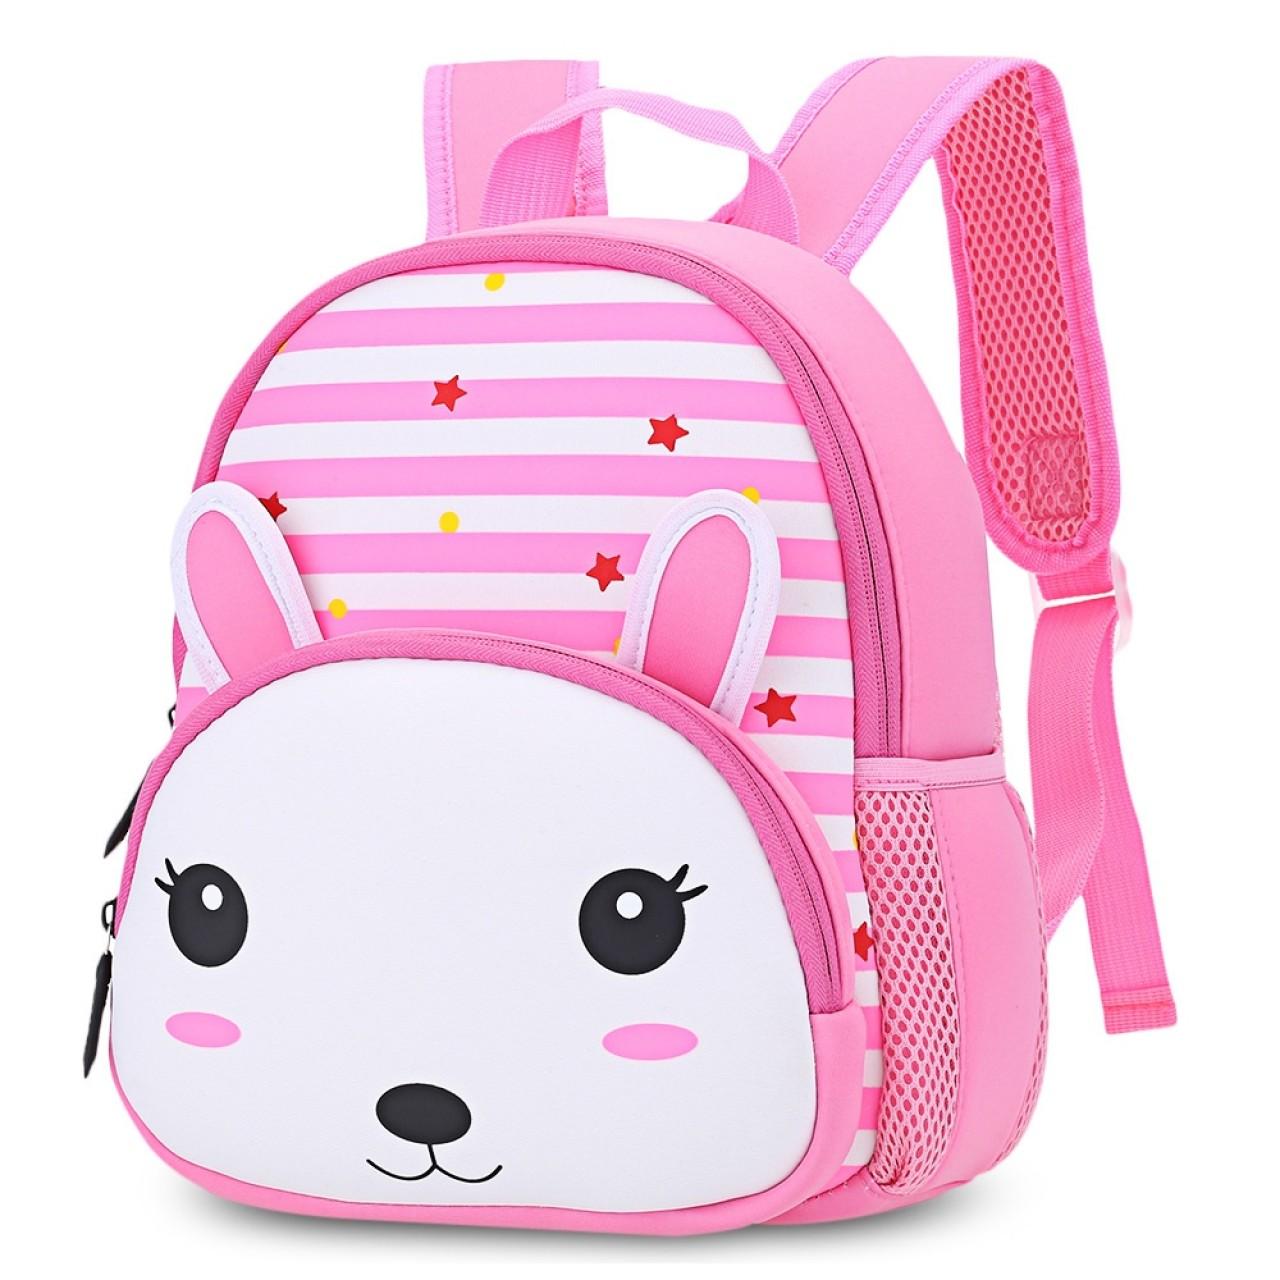 53845ba2f0a Παιδική τσάντα νηπιαγωγείου λαγουδάκι Παιδικά - Βρεφικά